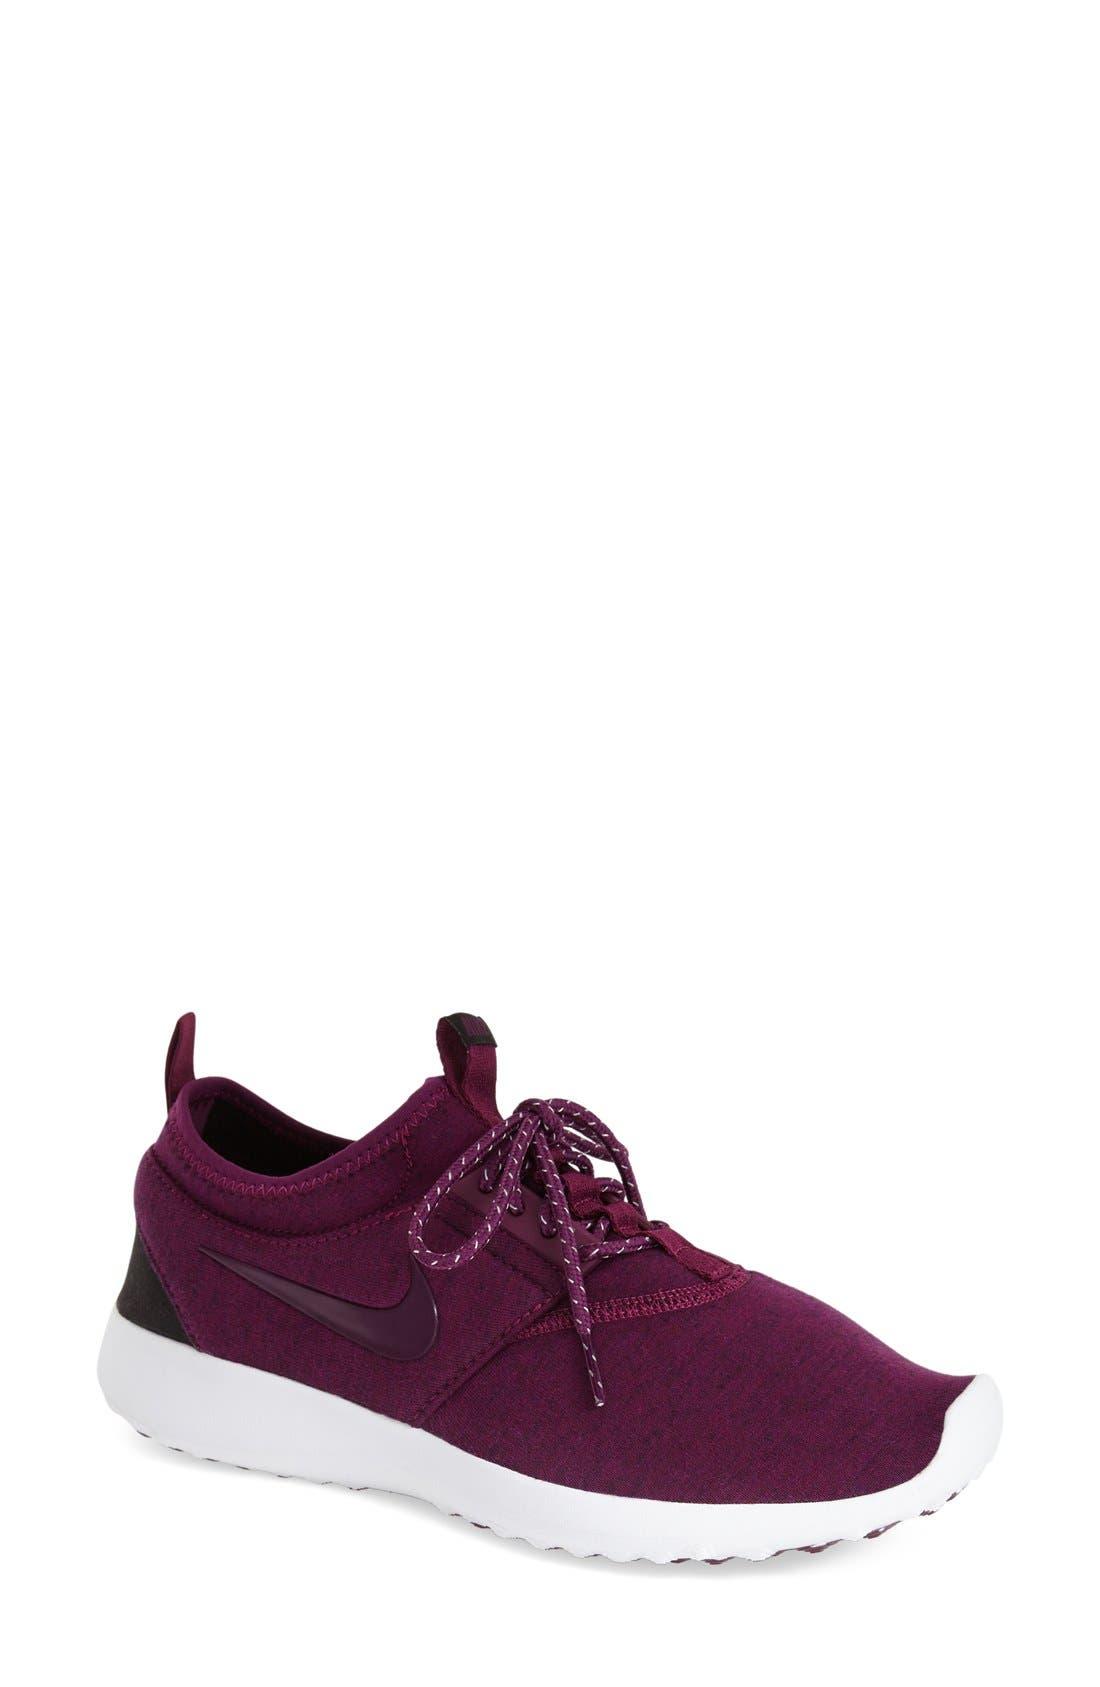 Main Image - Nike 'Juvenate Fleece' Sneaker (Women)